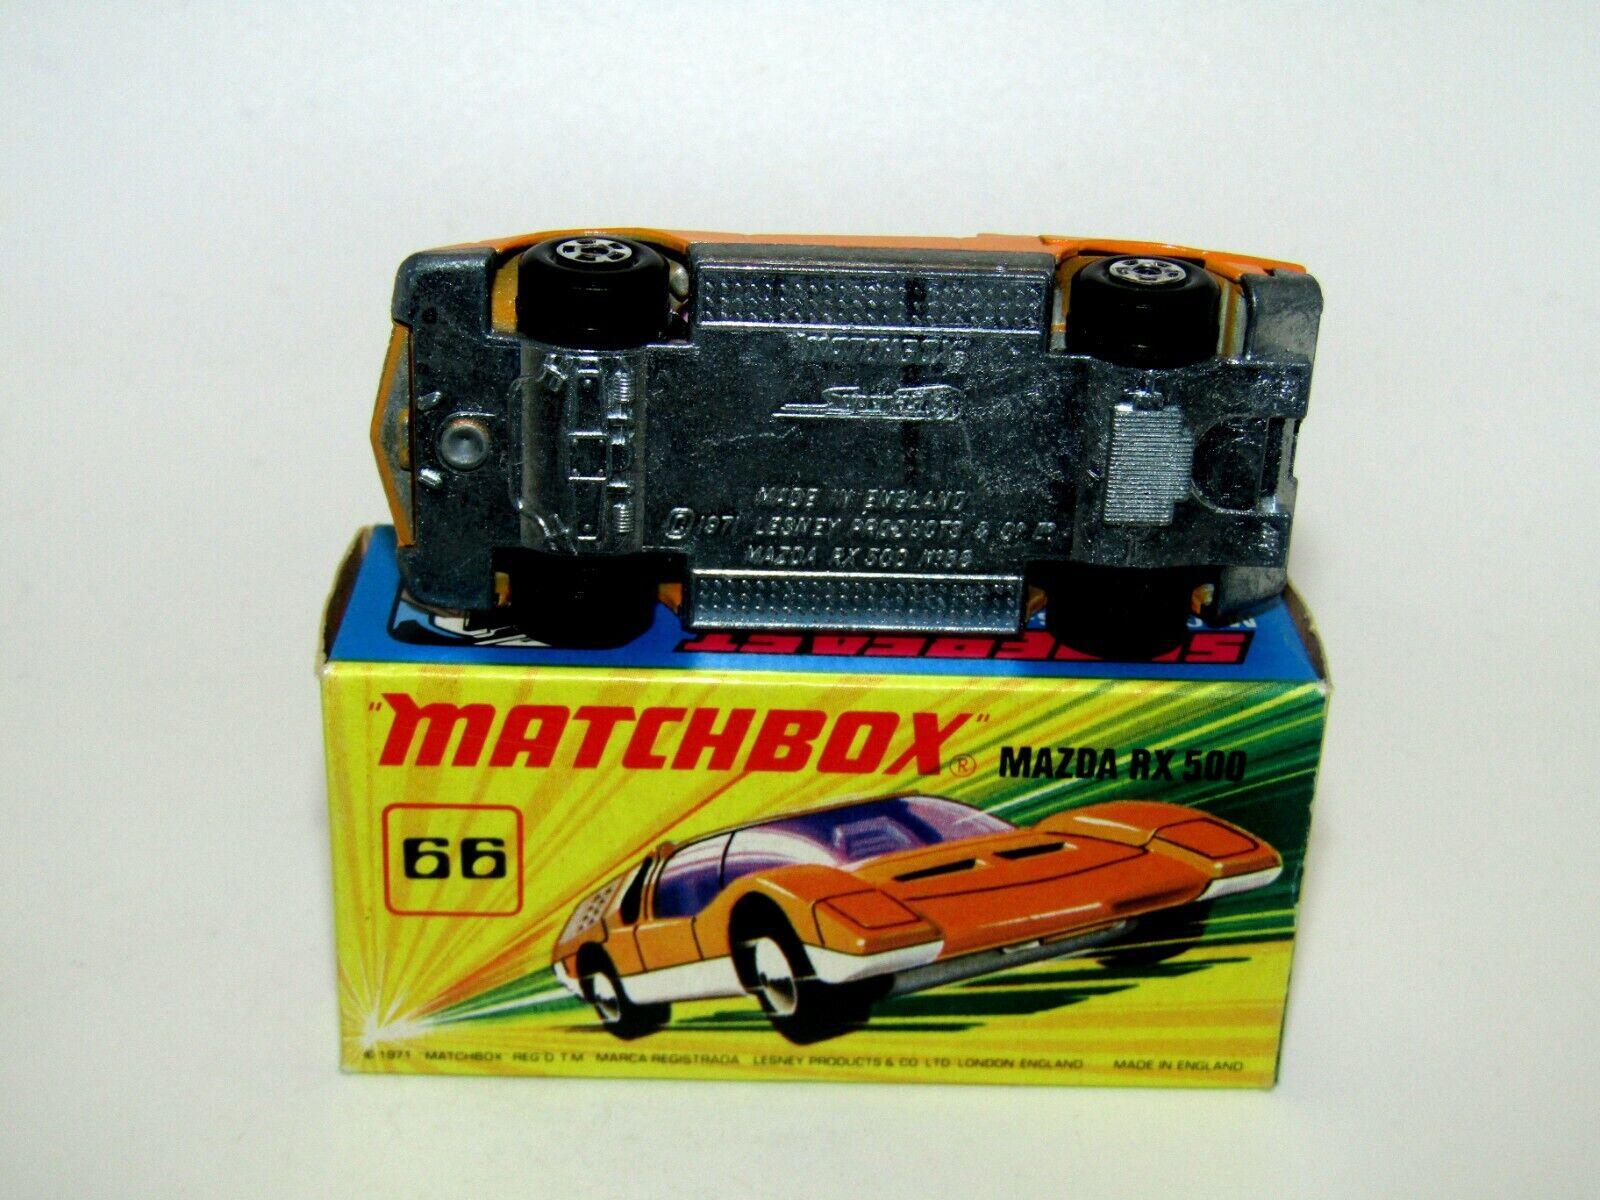 MatchBox Superfast No 66 Mazda RX500 Orange, UNPAINTED BASE VNMIB RARE